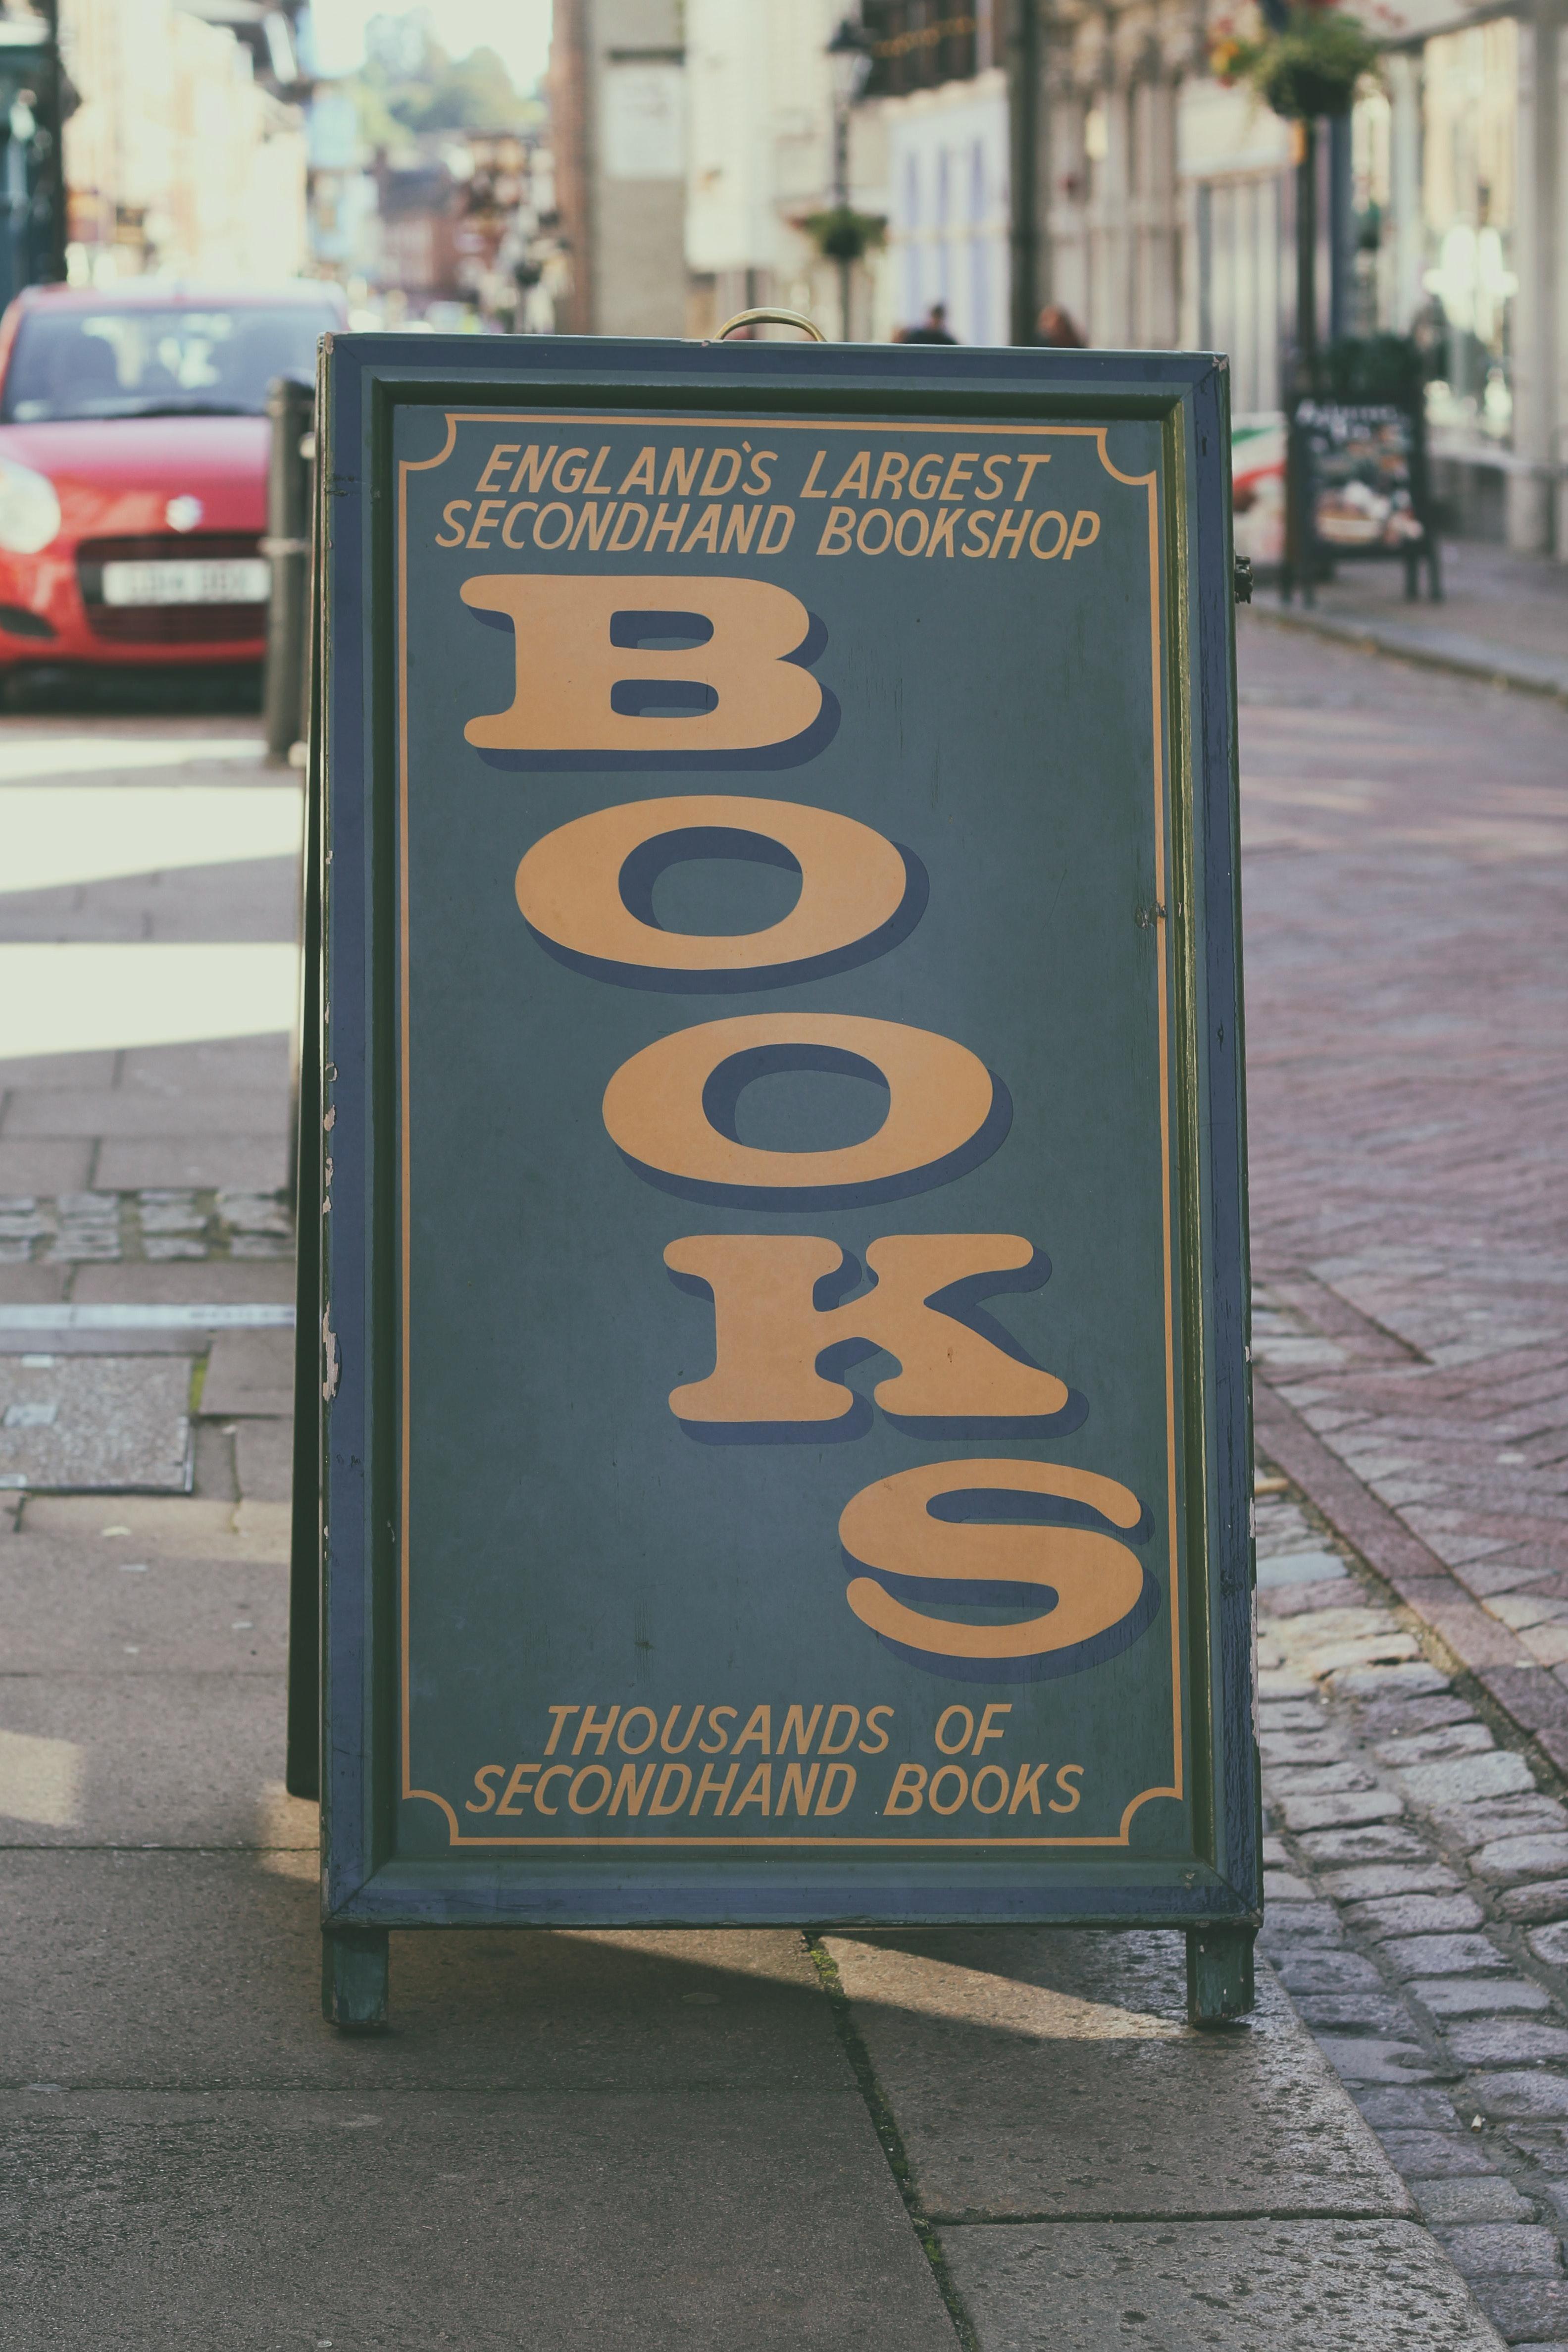 Books Signage, Public, Urban, Transportation system, Street, HQ Photo